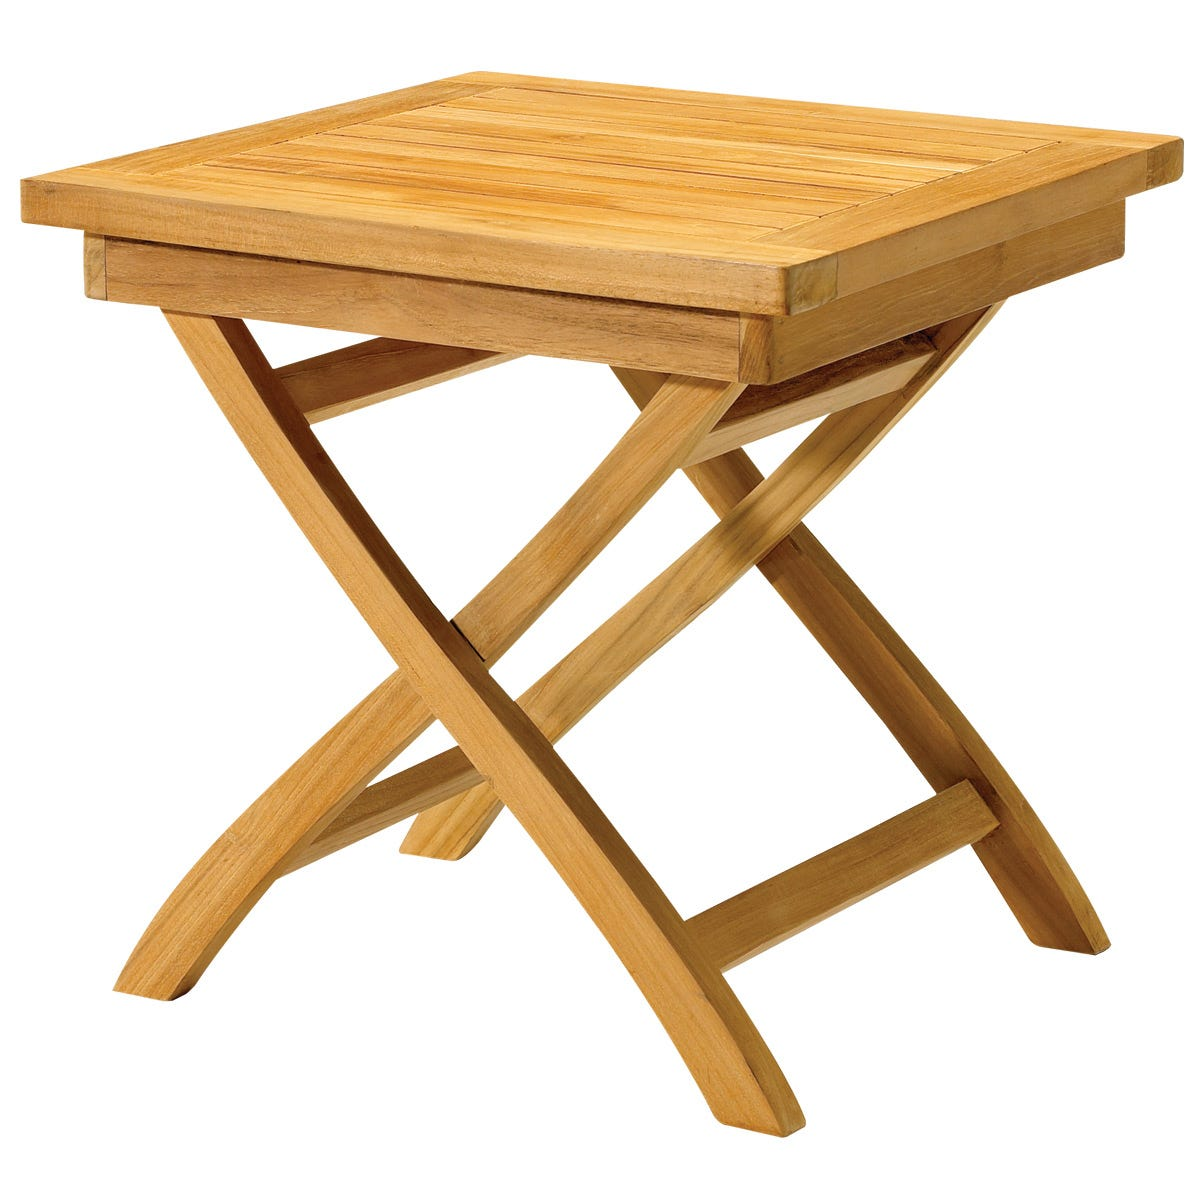 Outdoor Teak Folding Side Table - from Sportys Preferred ...